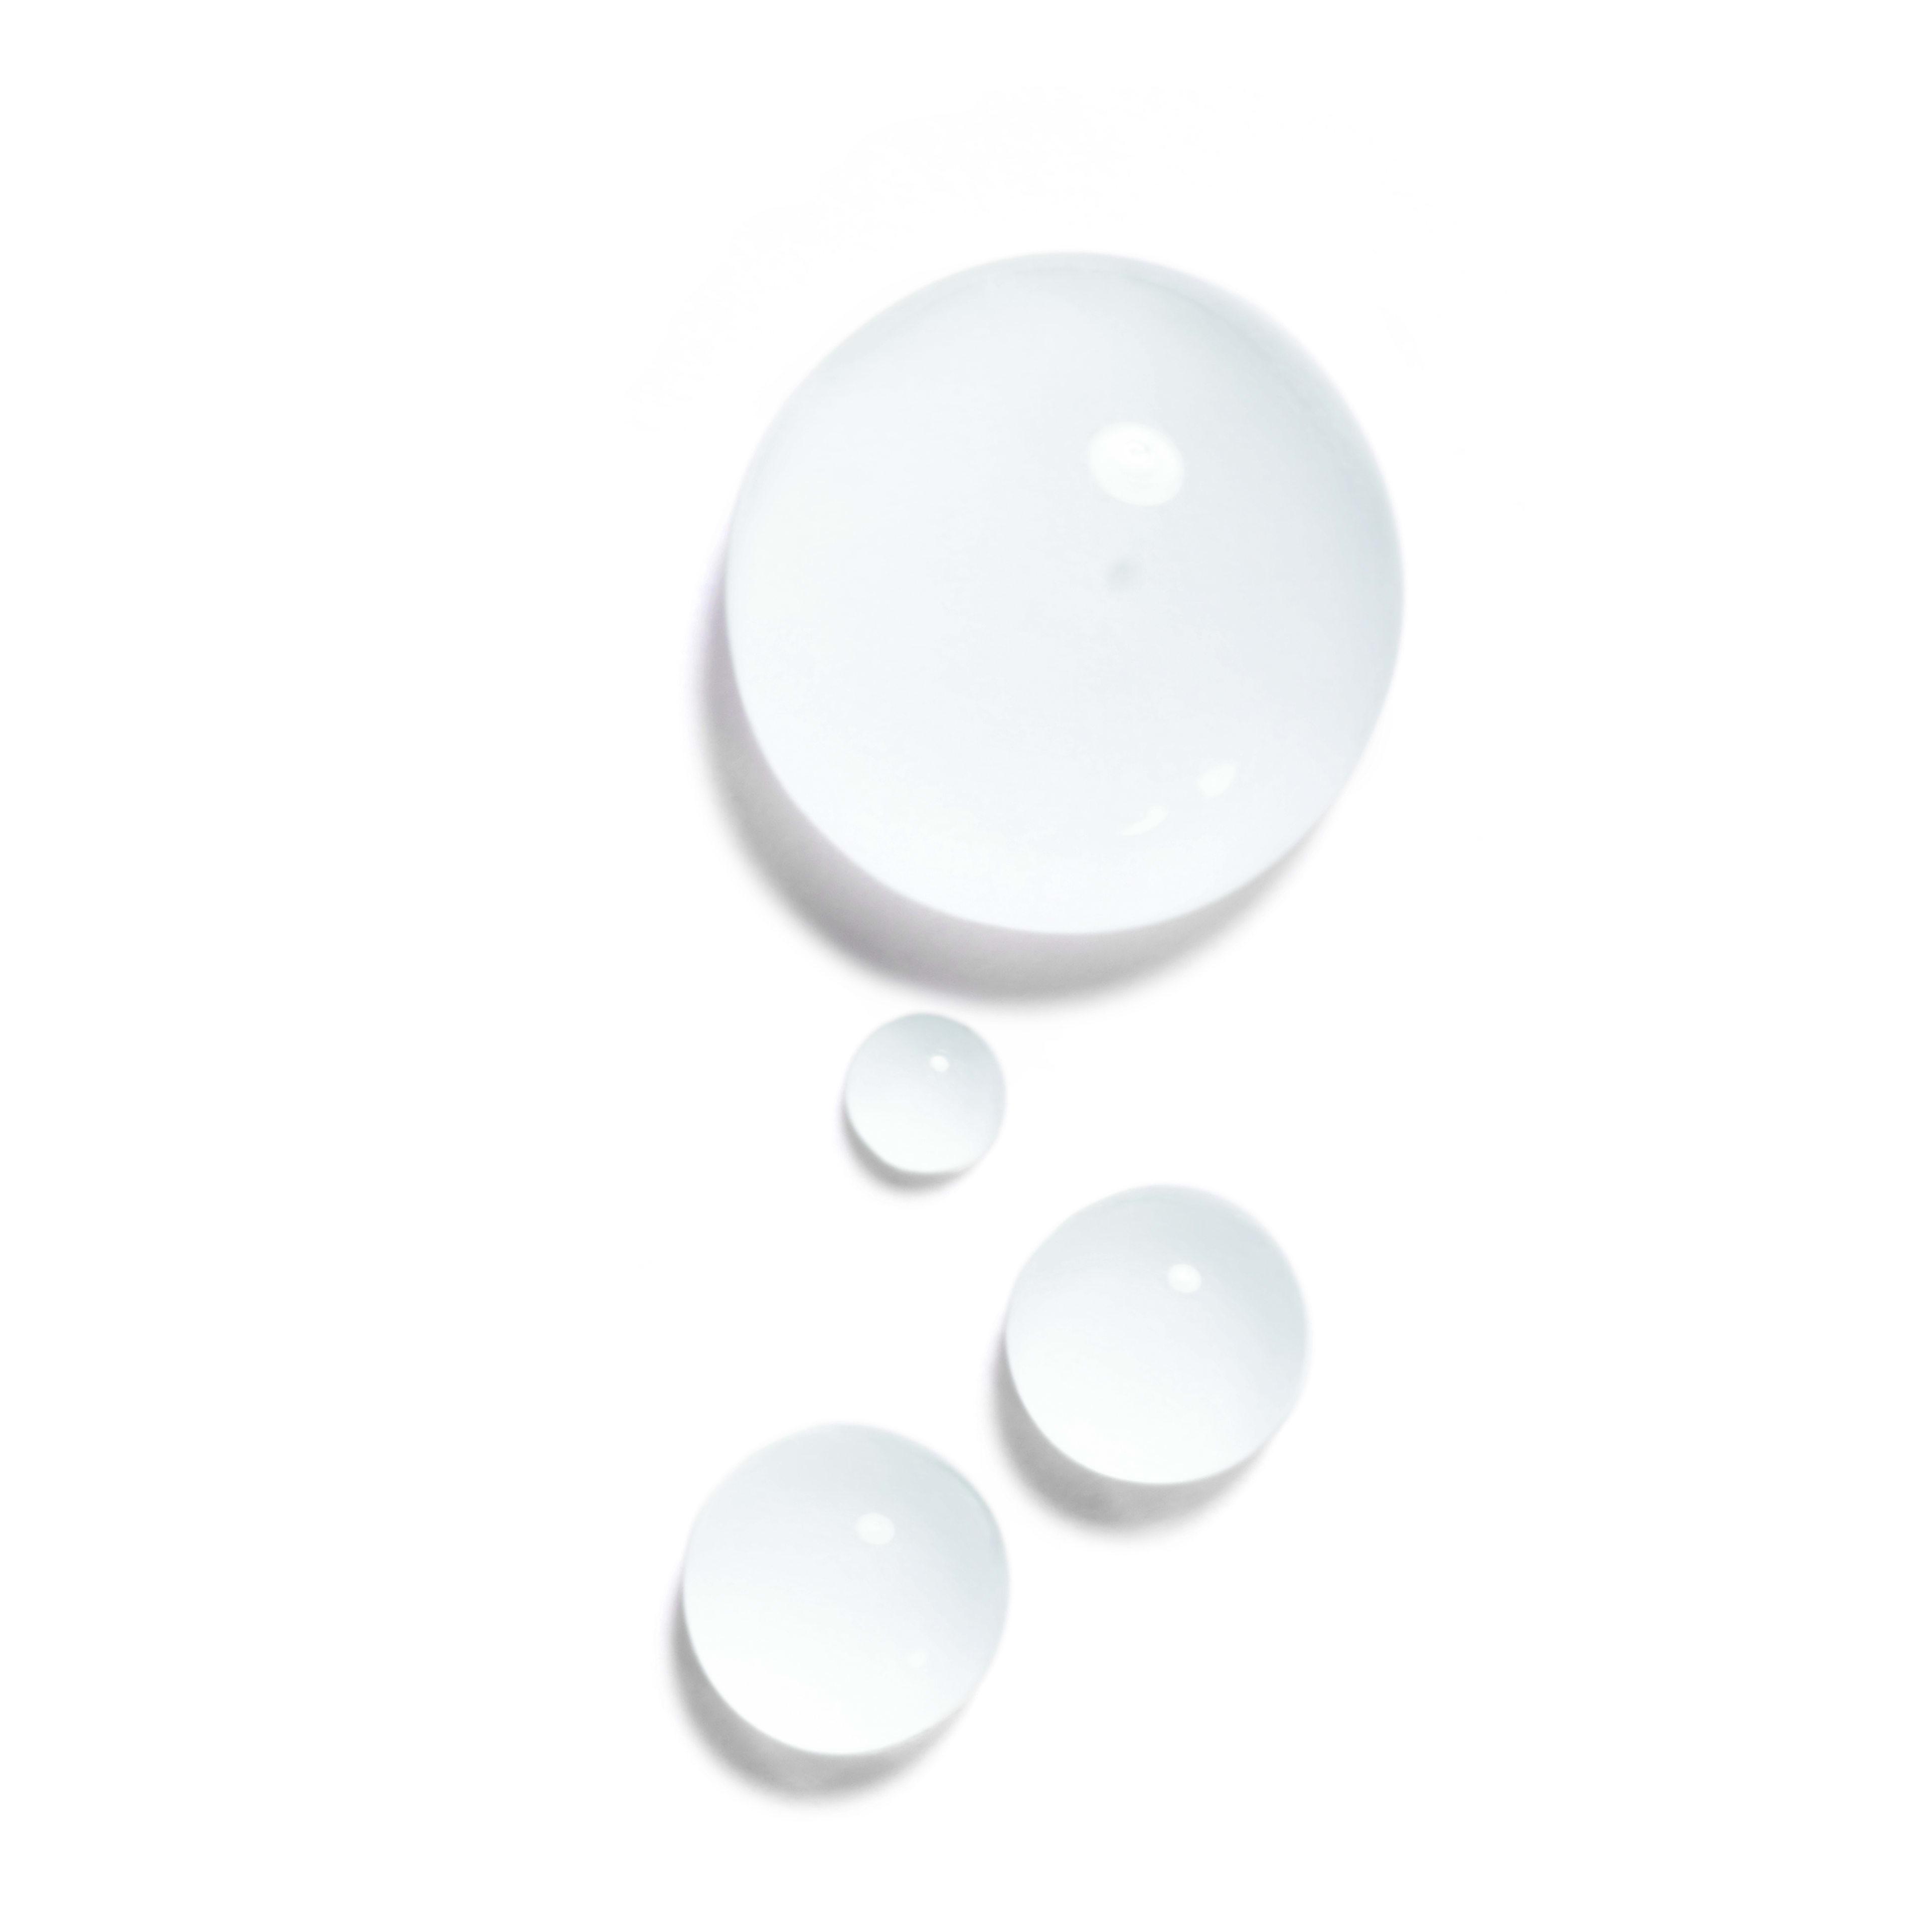 ALLURE HOMME SPORT - fragrance - 3.4FL. OZ. -                                                                 alternative view - see full sized version